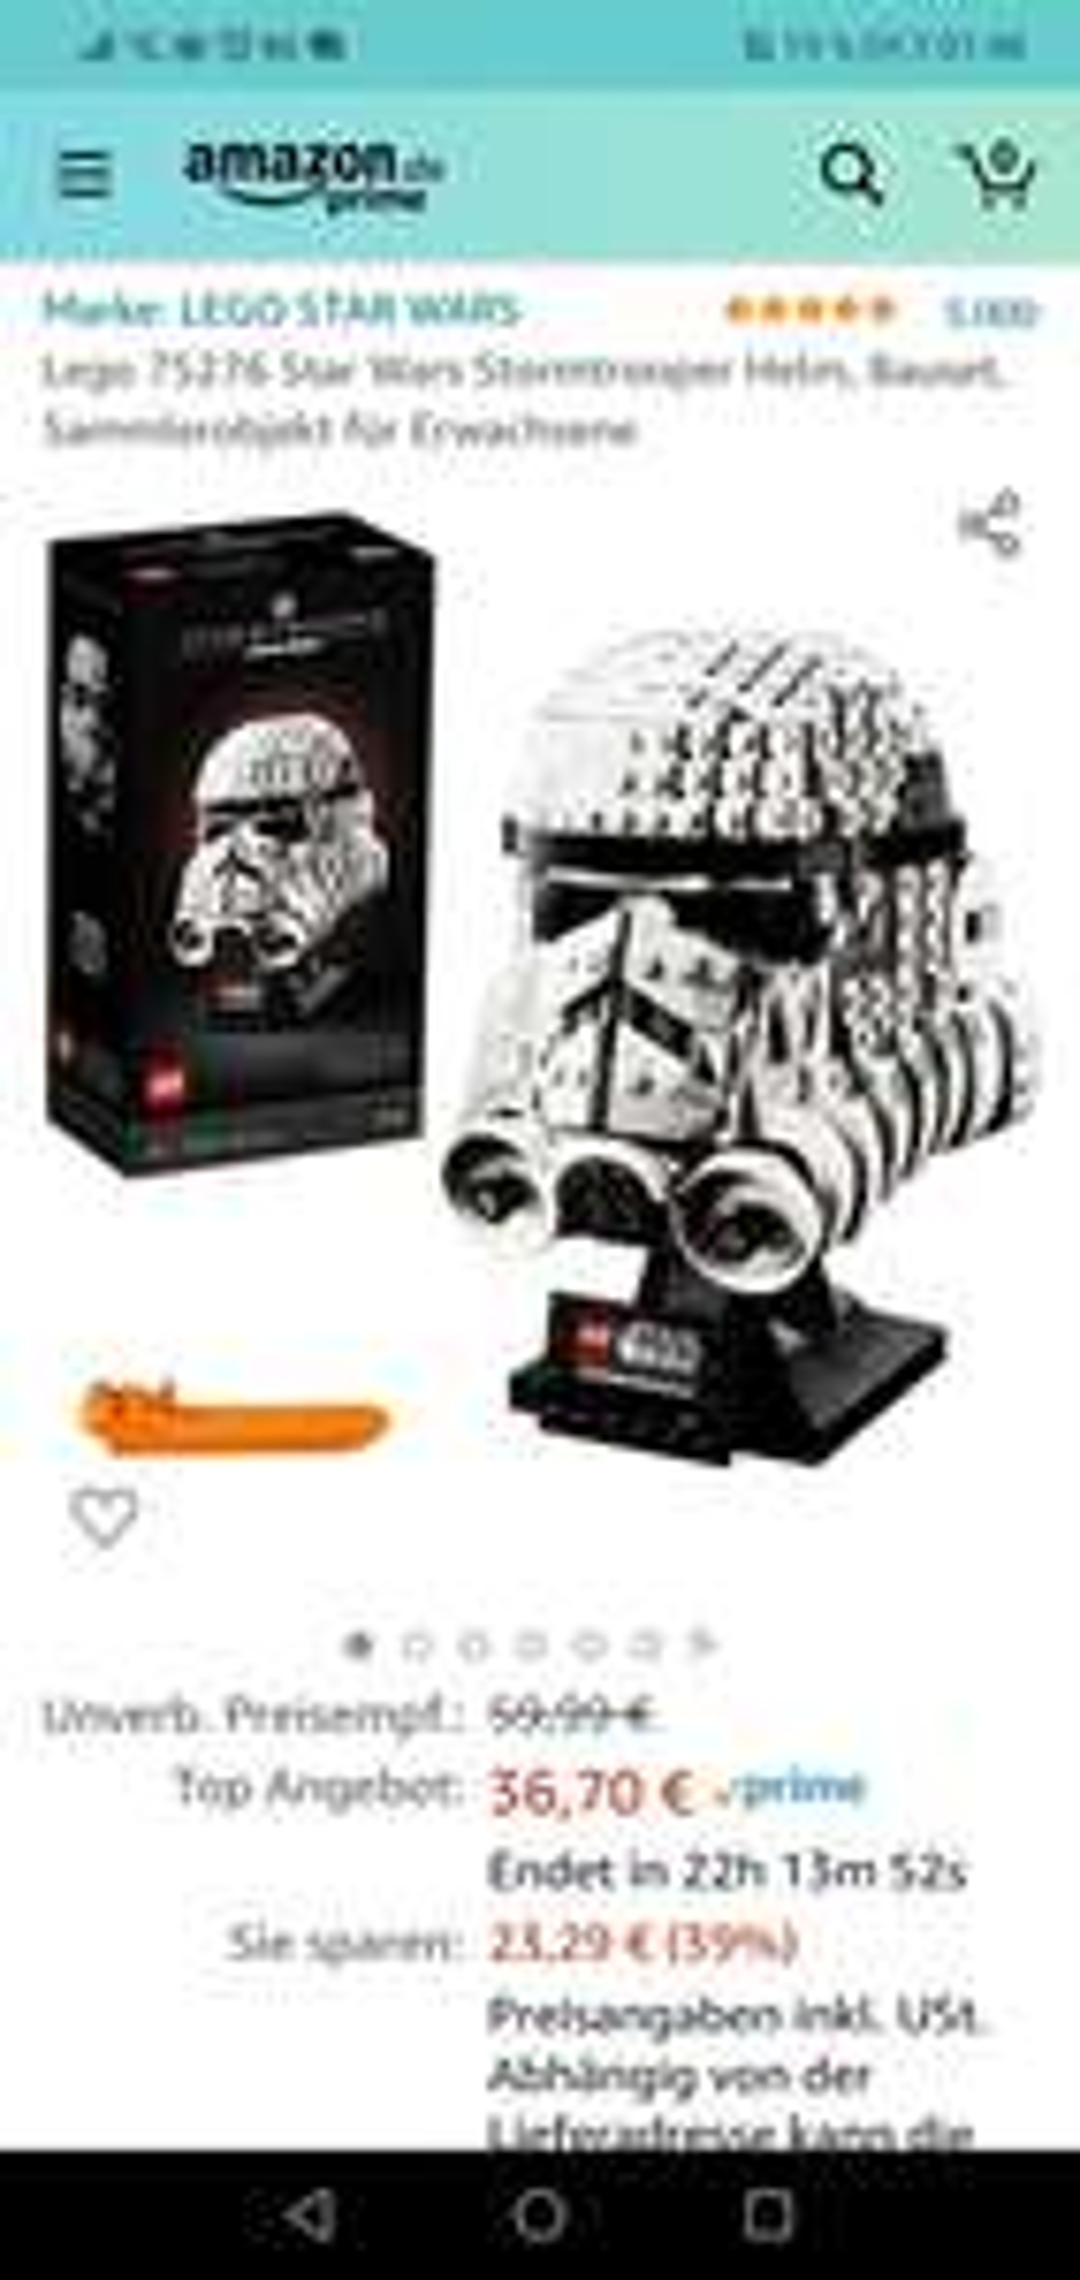 Lego 75276 Star Wars Stormtrooper Helm